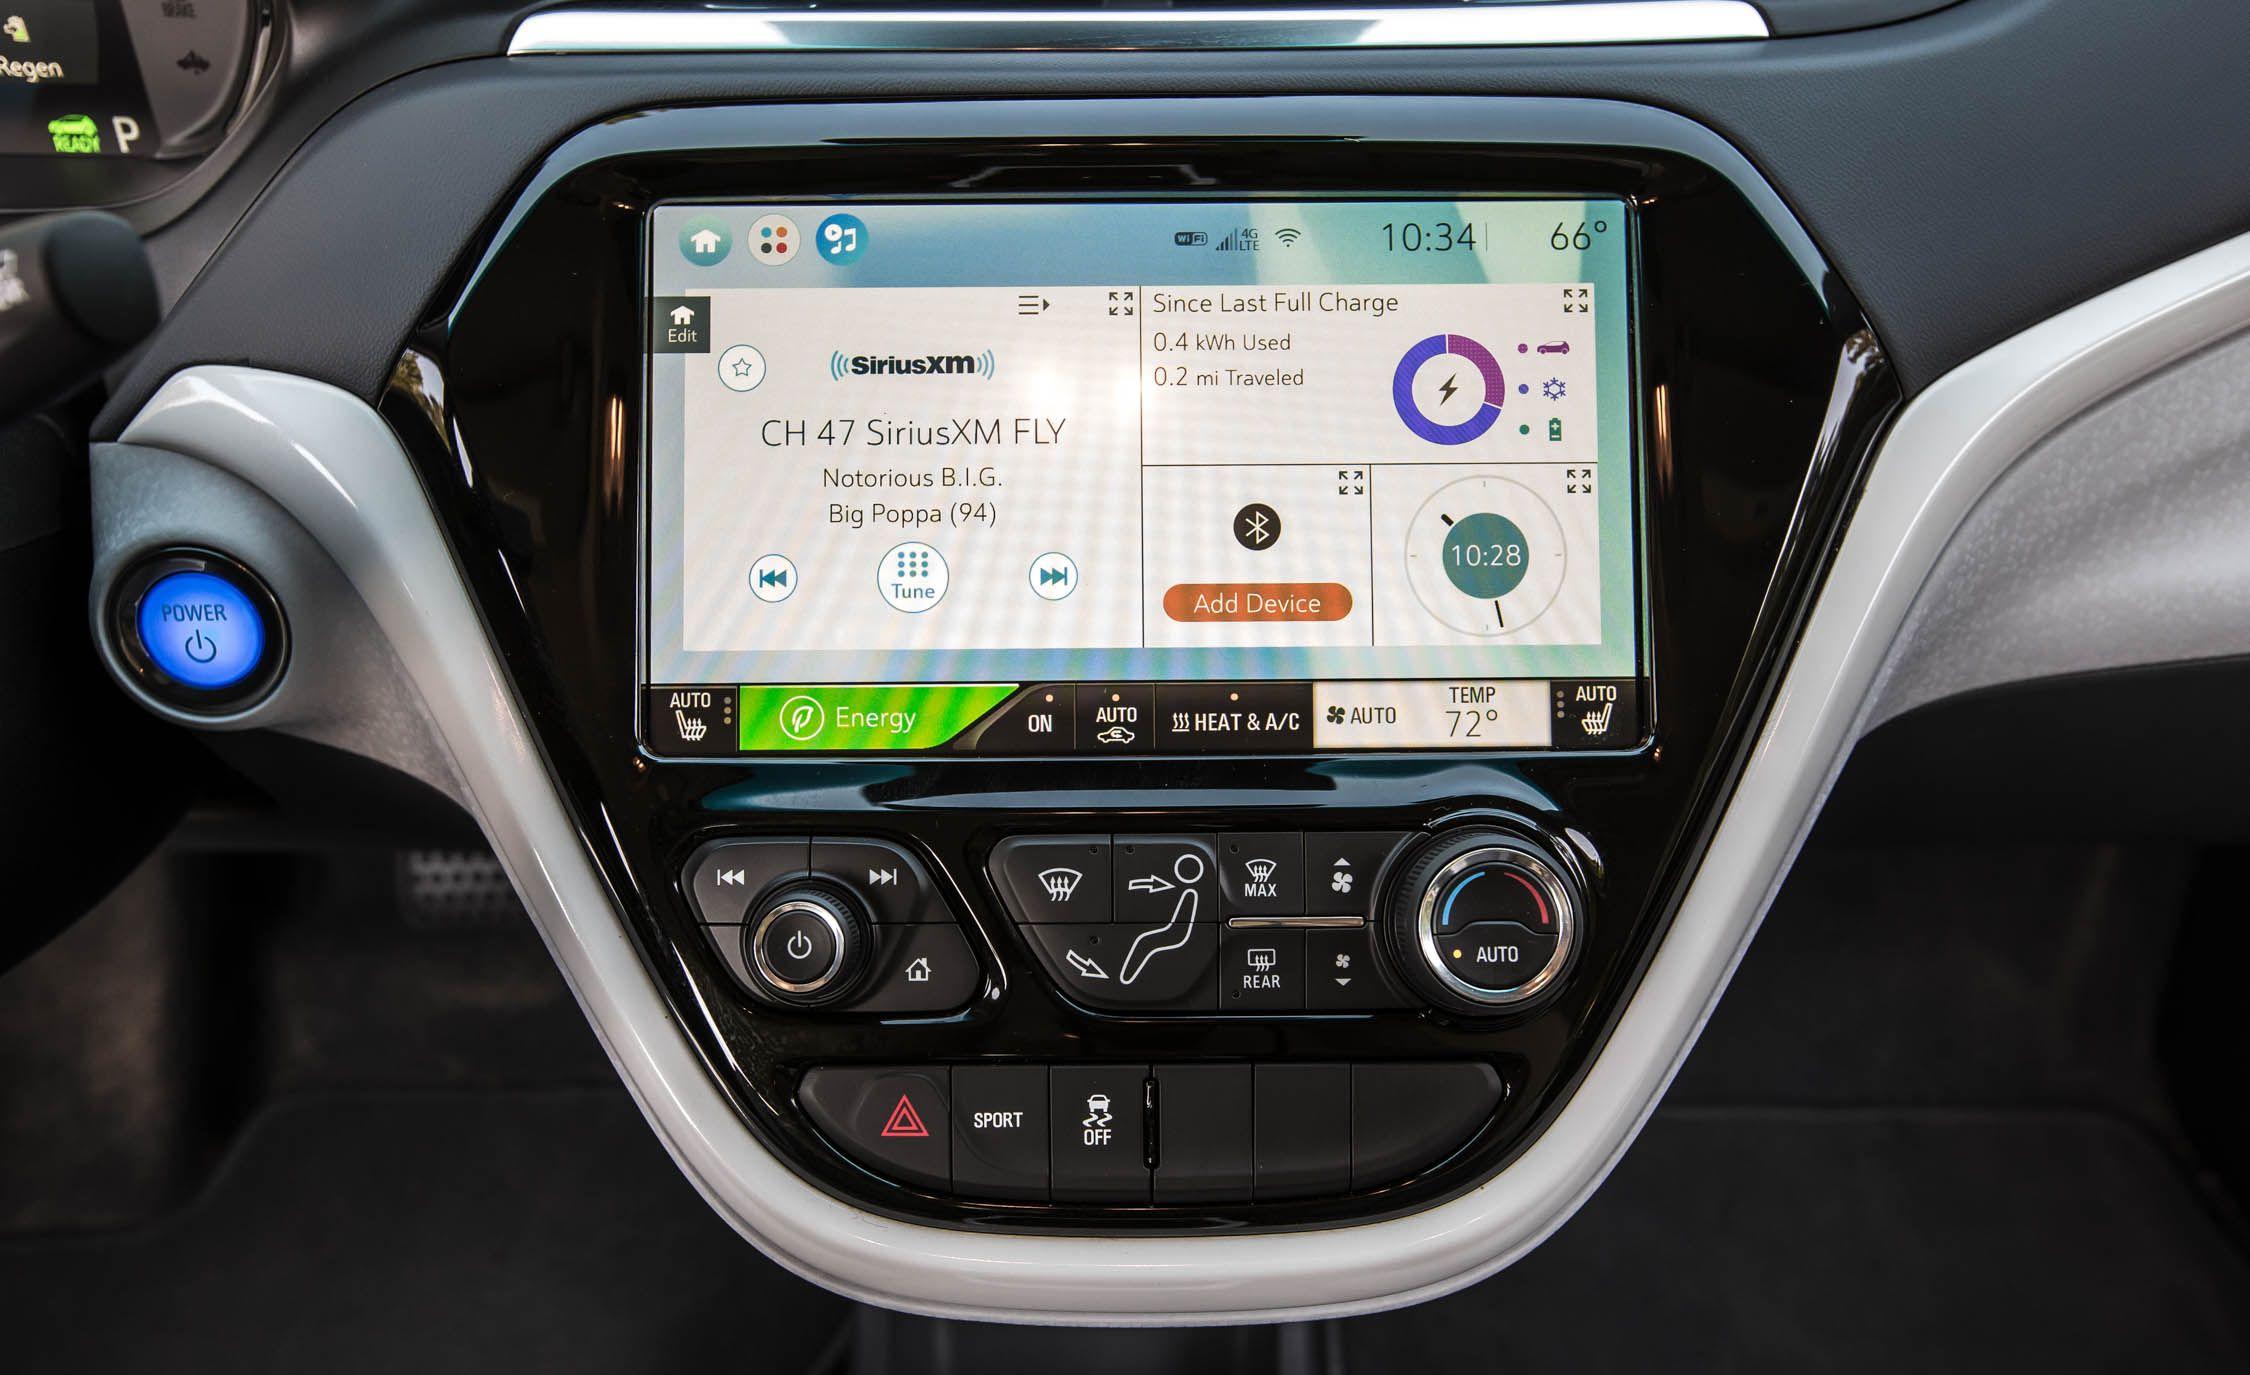 Go Look Importantbook Measuring Instrument Of Potential Difference Modern Electronic Circuit Design Hasil Gambar Untuk In Car